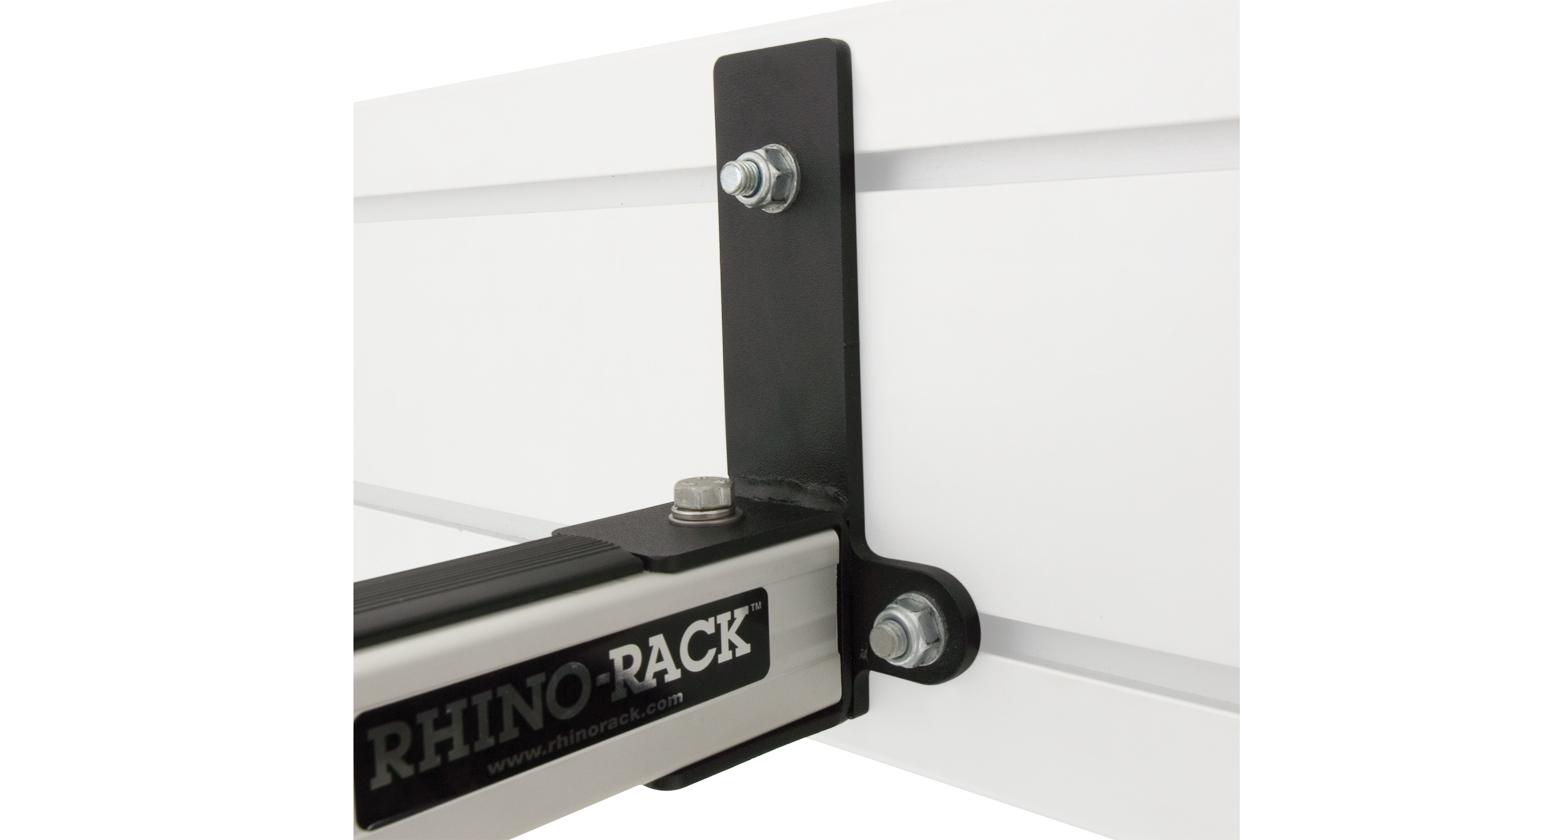 Batwing HD Bracket Kit